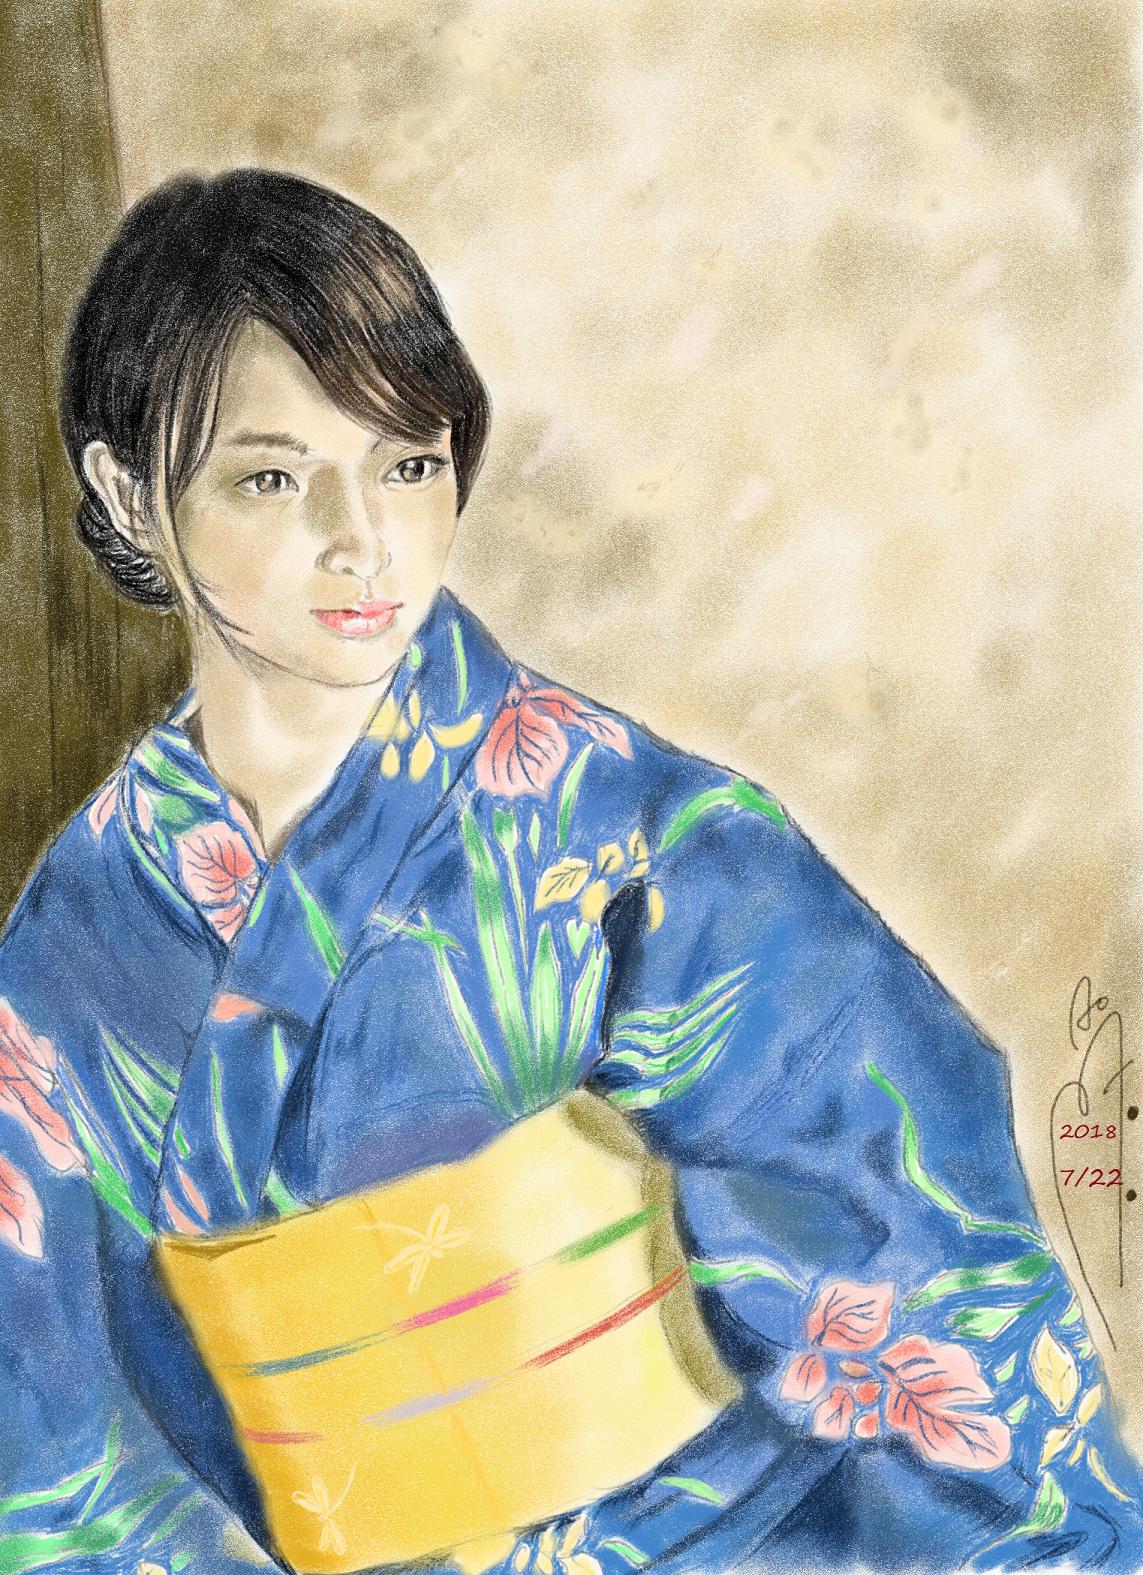 武井咲の浴衣姿似顔絵